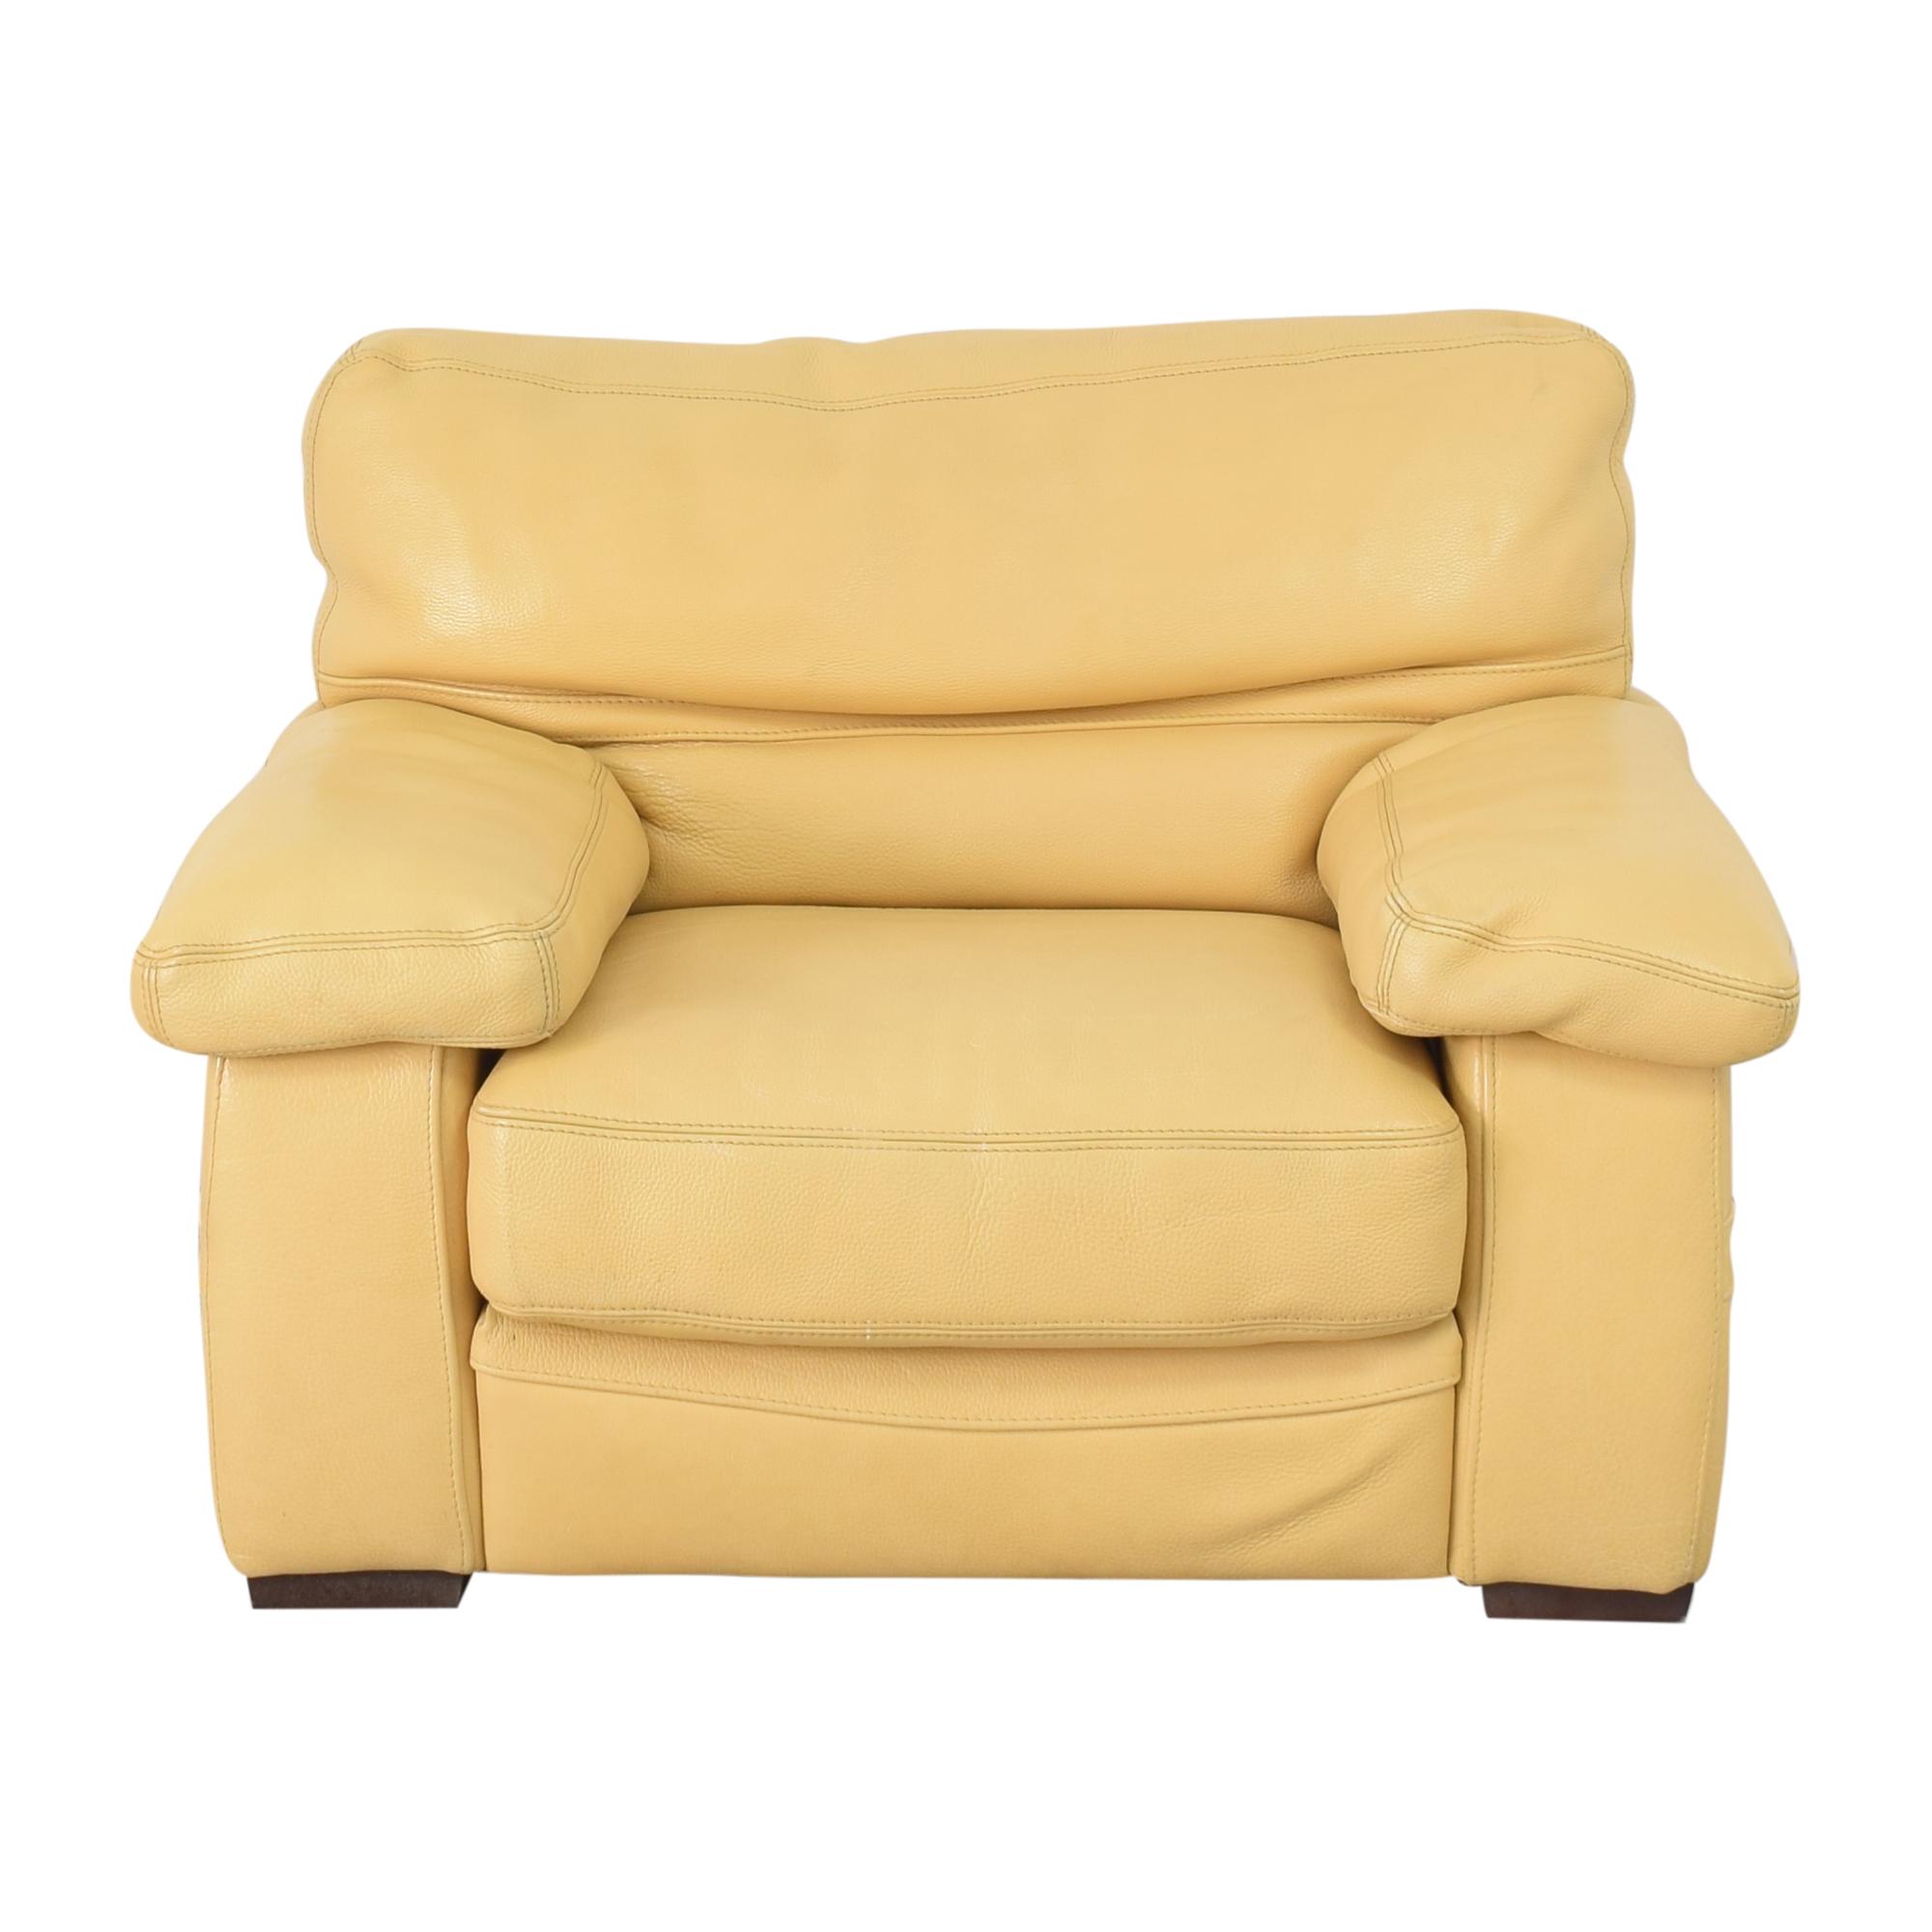 Roche Bobois Roche Bobois Accent Armchair with Ottoman for sale